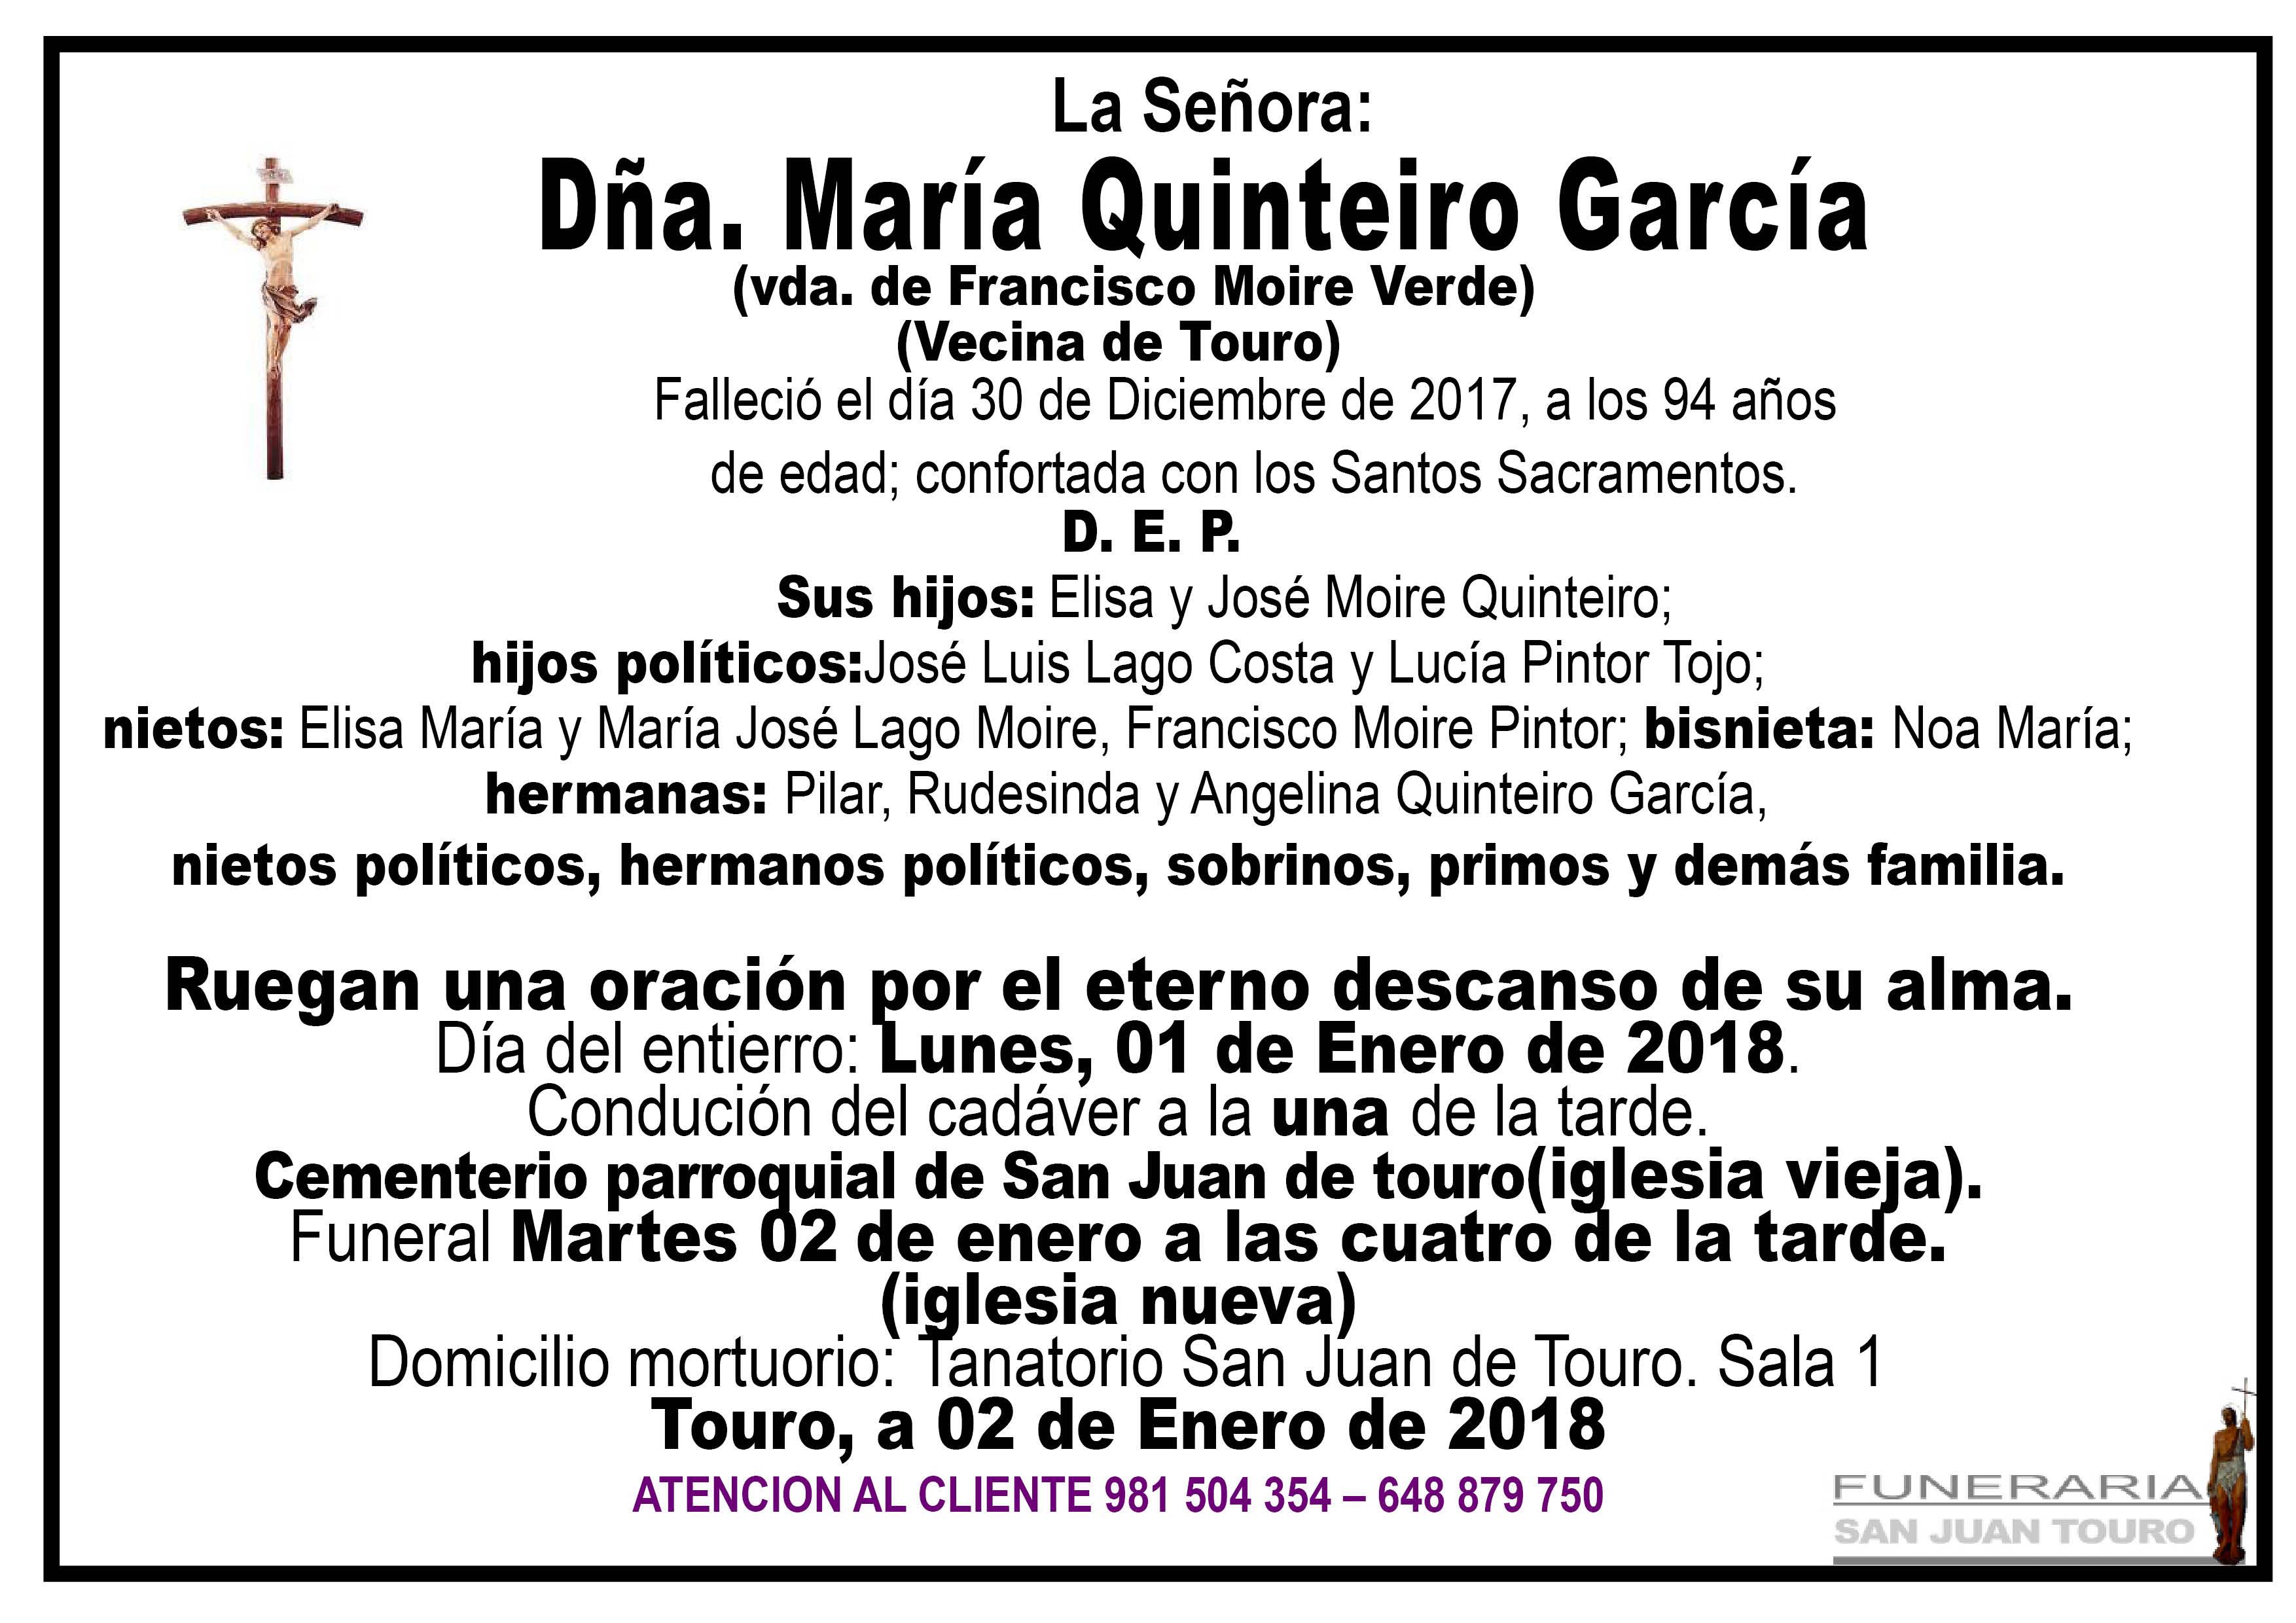 Esquela de SEPELIO DE DÑA. MARIA QUINTEIRO GARCIA